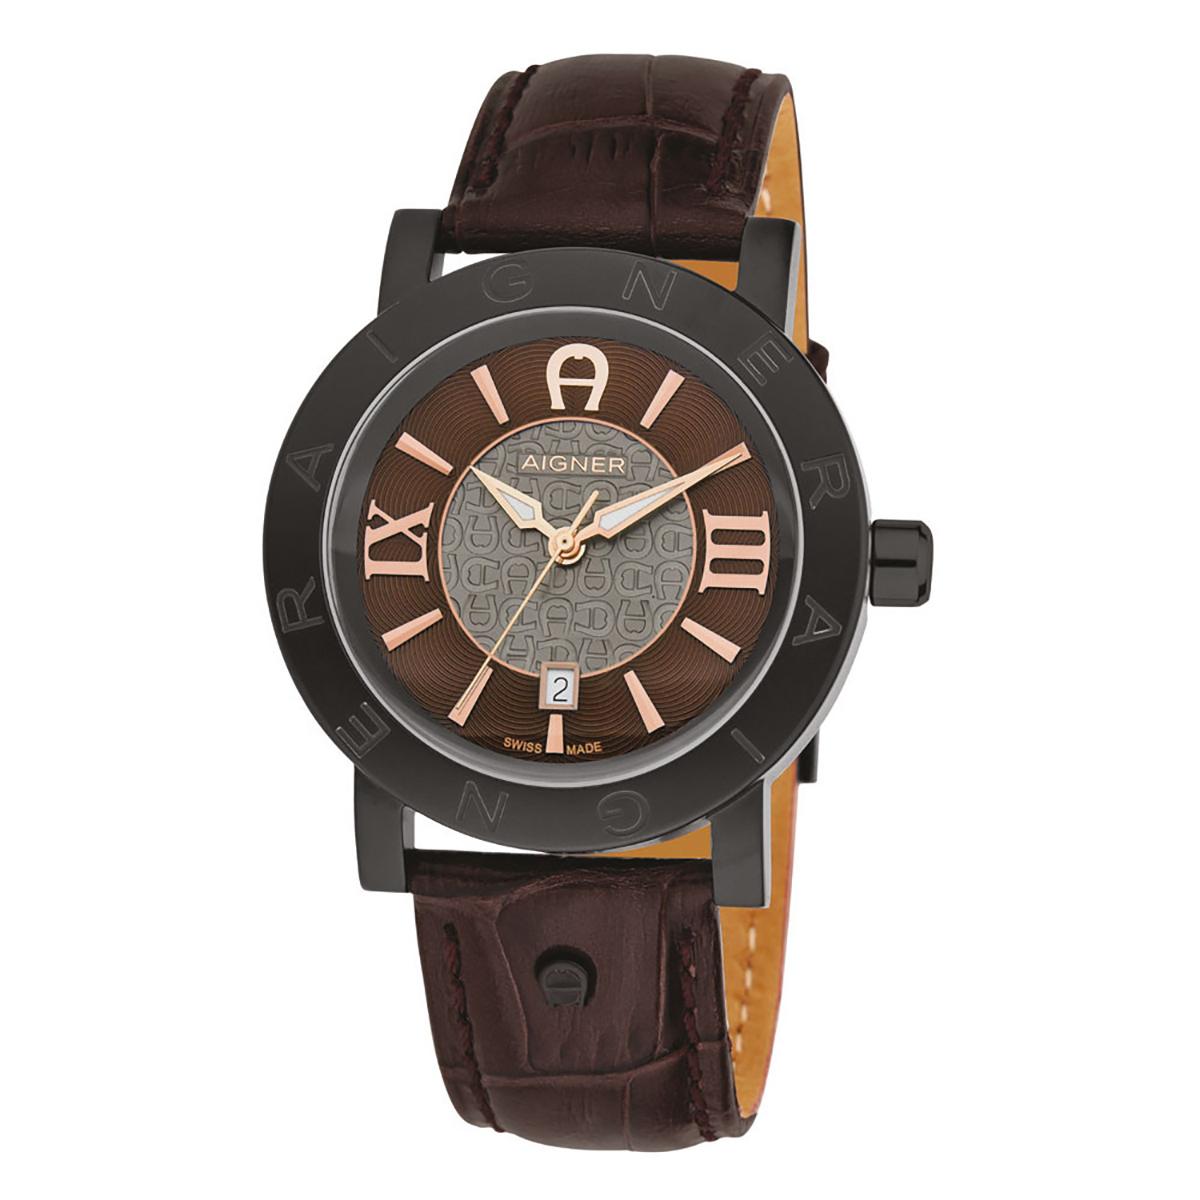 ساعت مچی عقربه ای مردانه اگنر مدل A26093 34